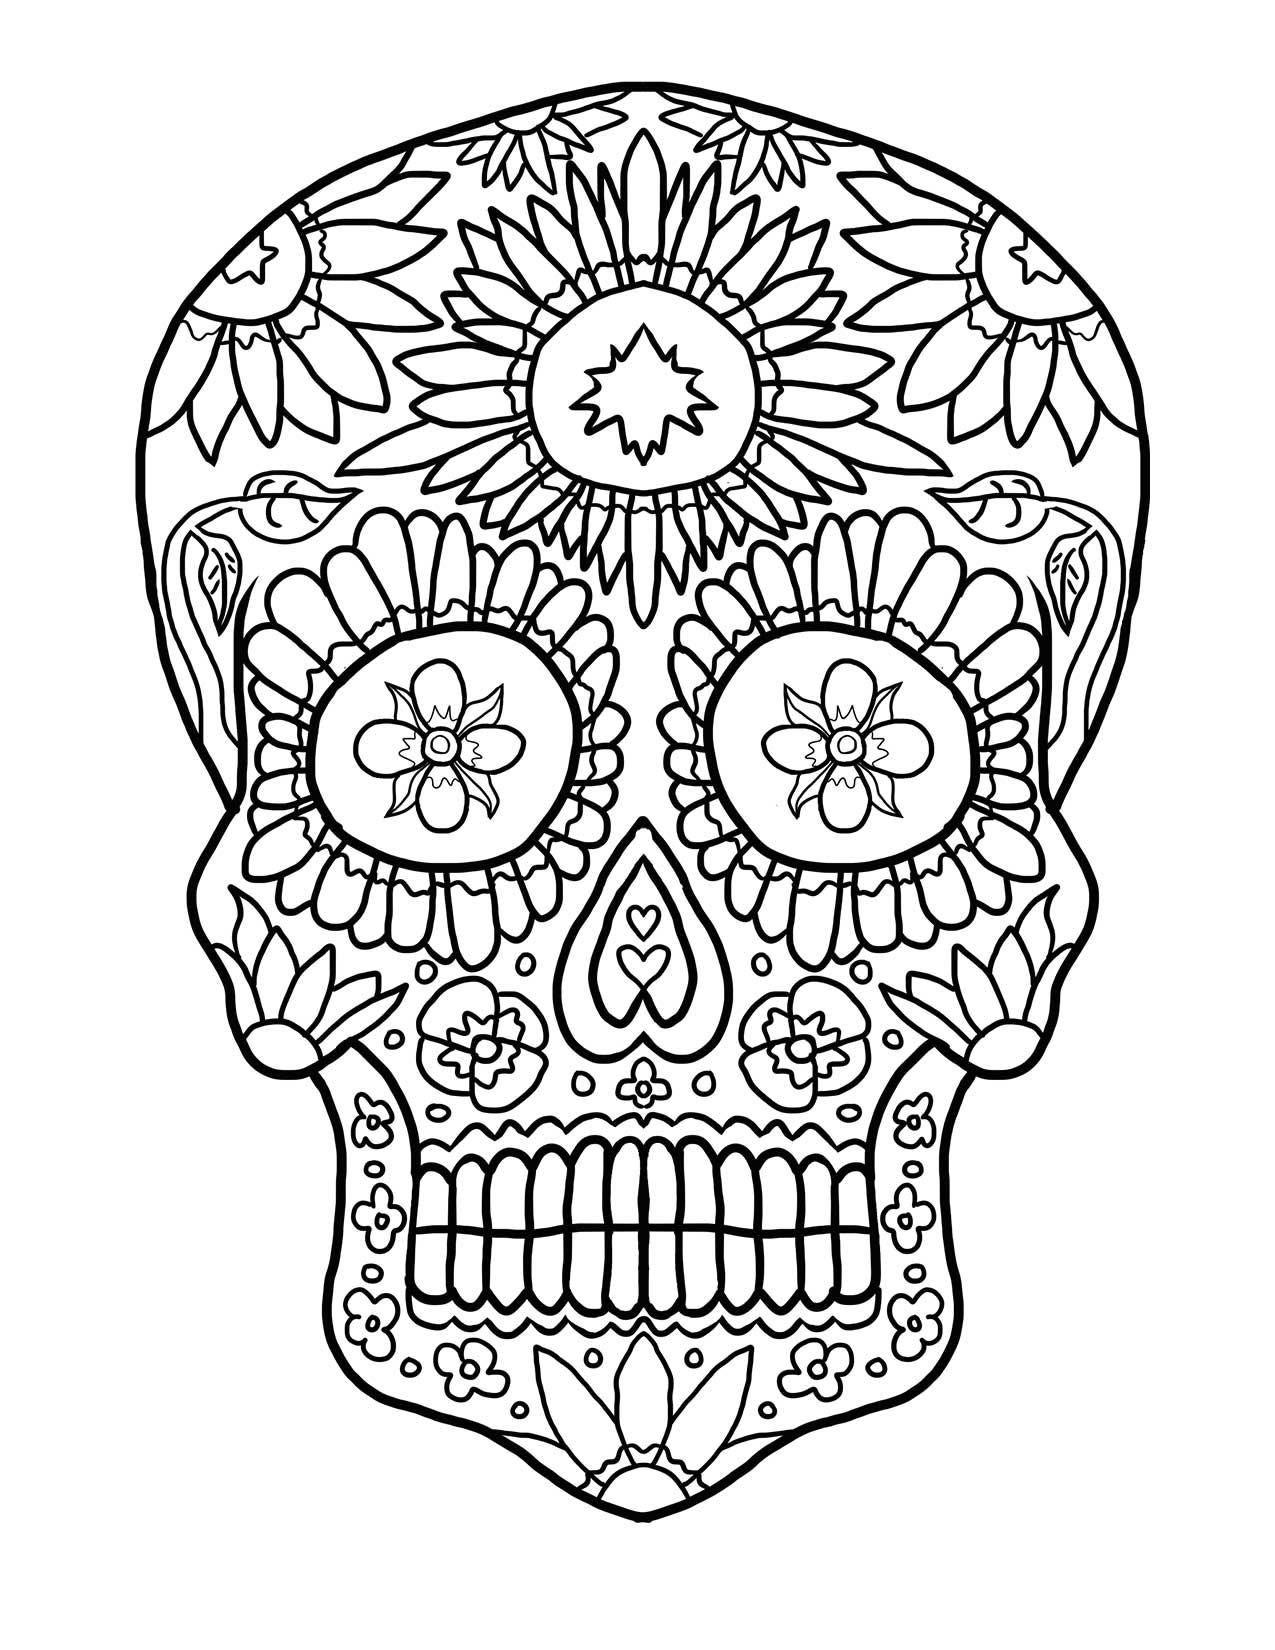 Dibujos De Calaveras Para Colorear Decalaveras Com